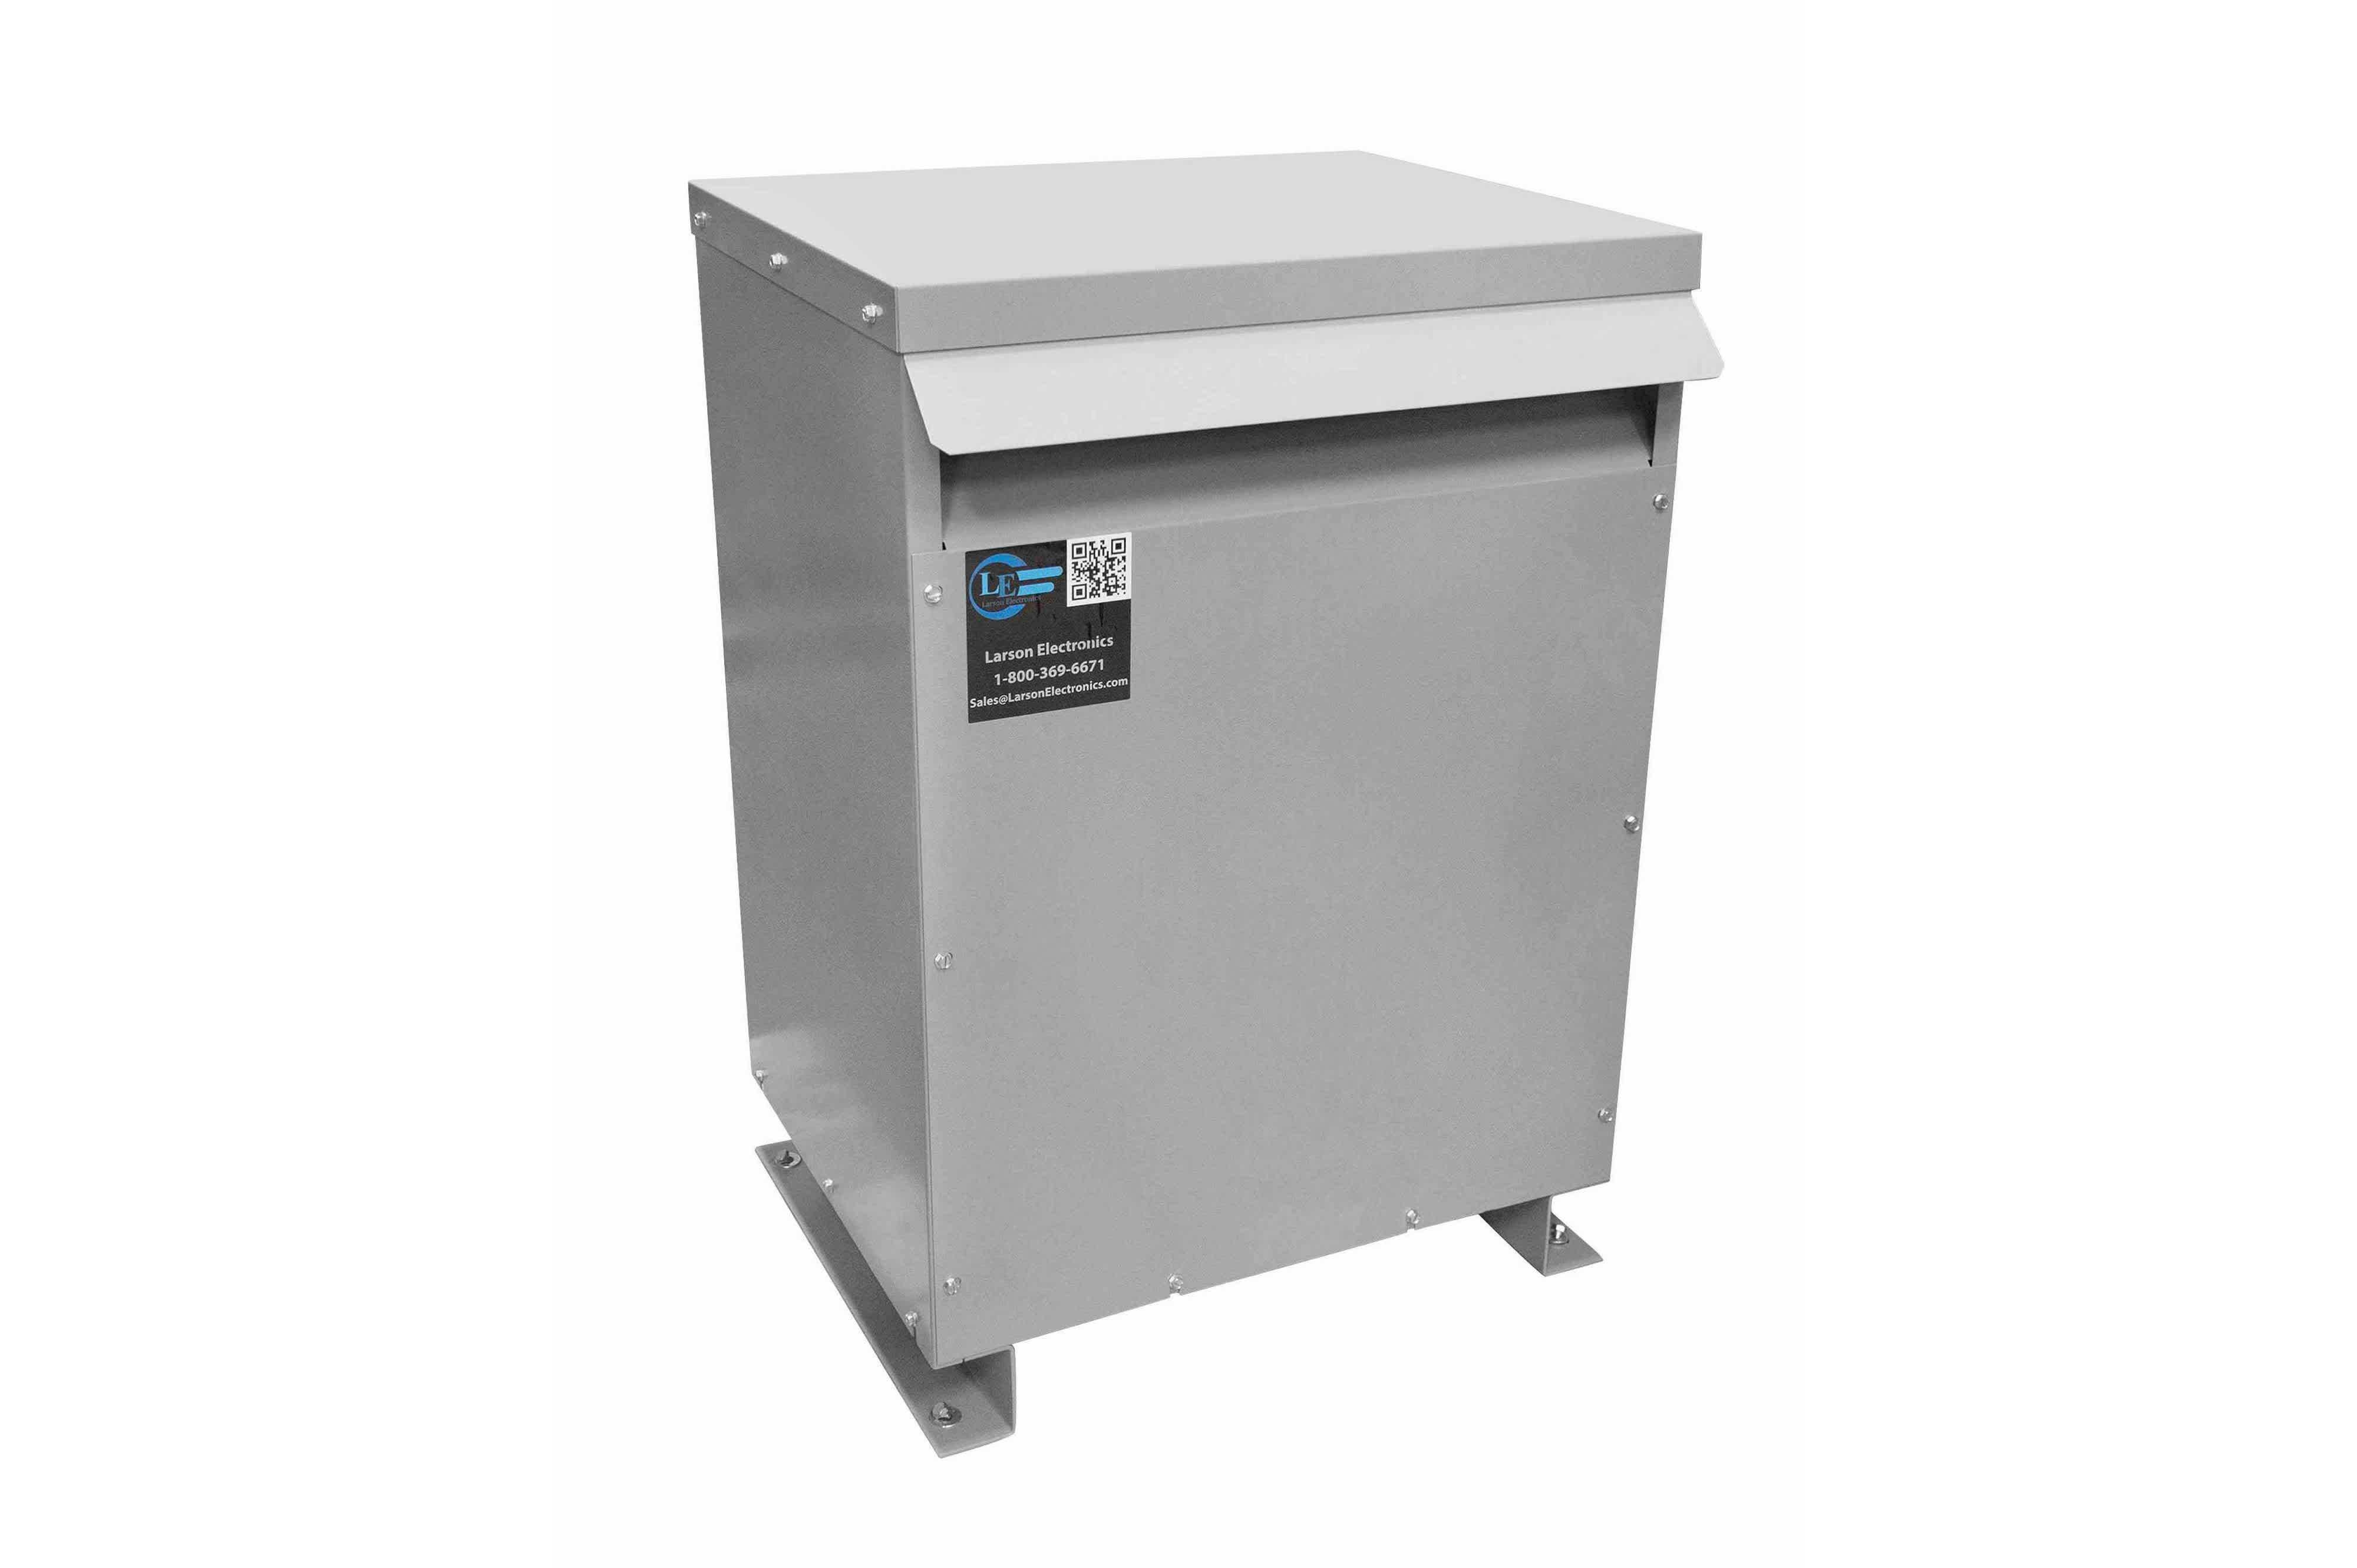 30 kVA 3PH Isolation Transformer, 460V Wye Primary, 400V Delta Secondary, N3R, Ventilated, 60 Hz